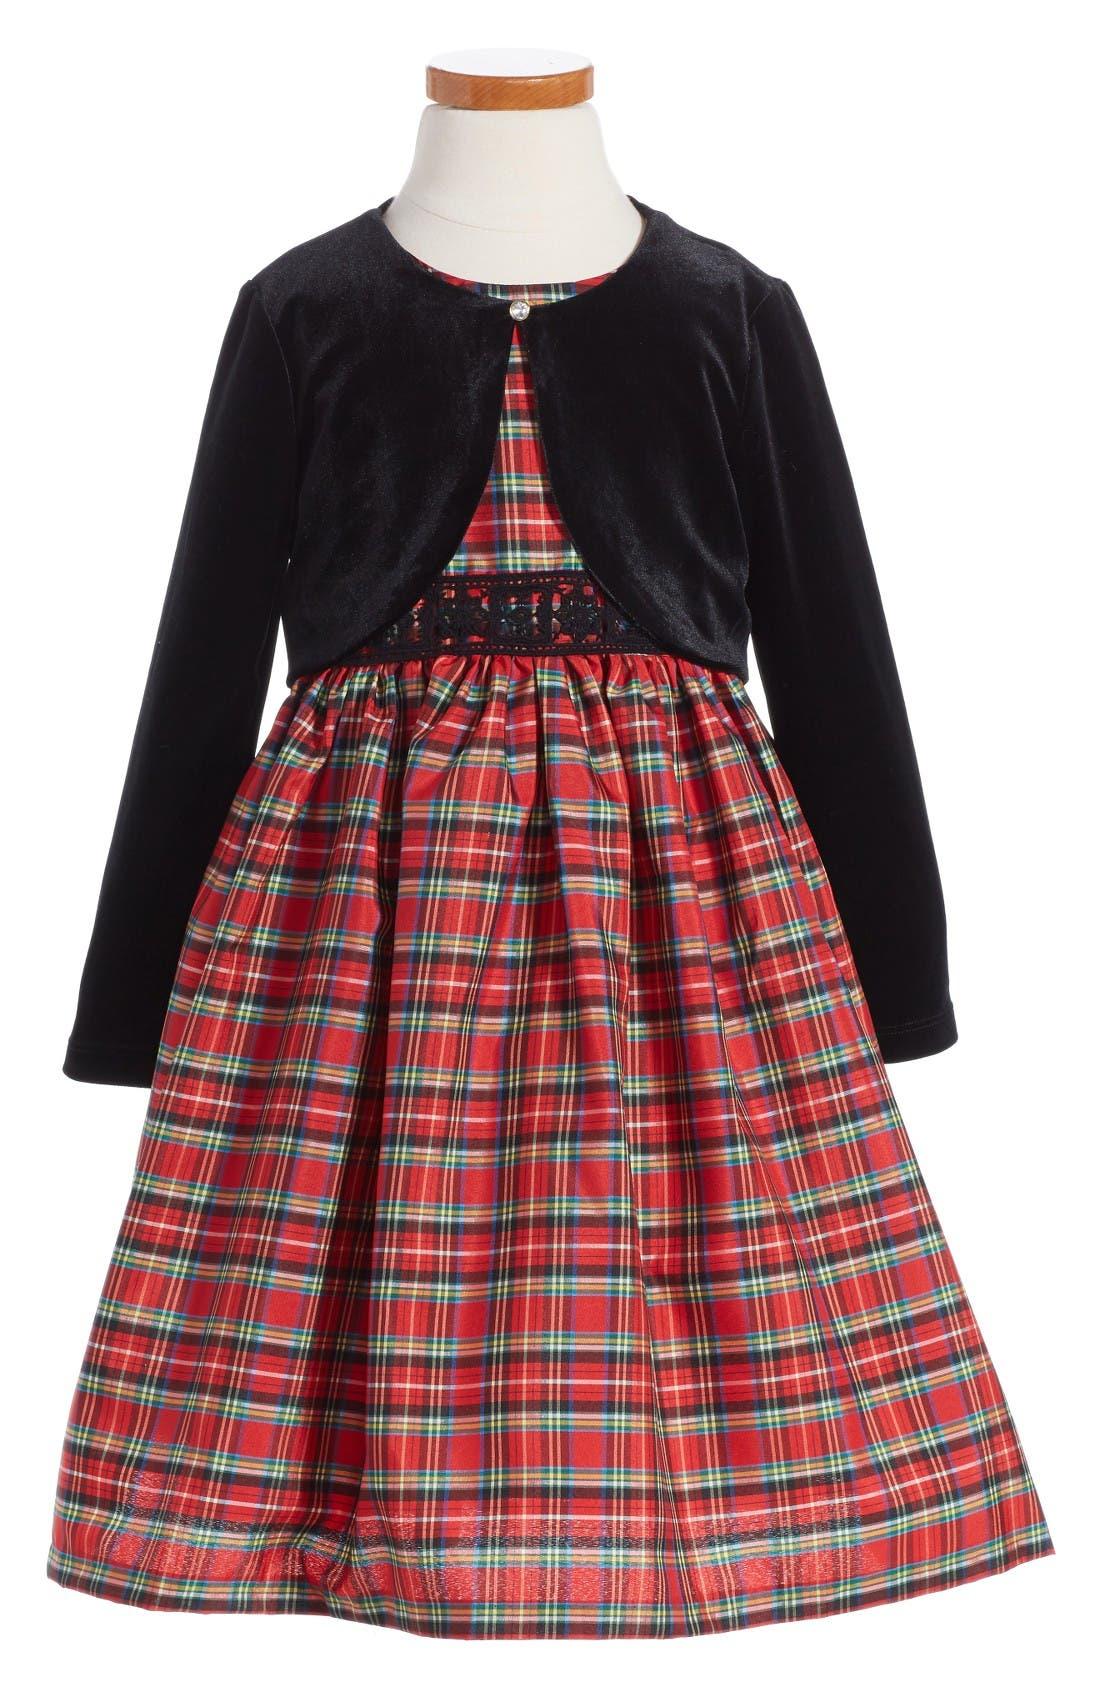 Alternate Image 1 Selected - Pippa & Julie Plaid Dress & Velvet Jacket (Toddler Girls, Little Girls & Big Girls)